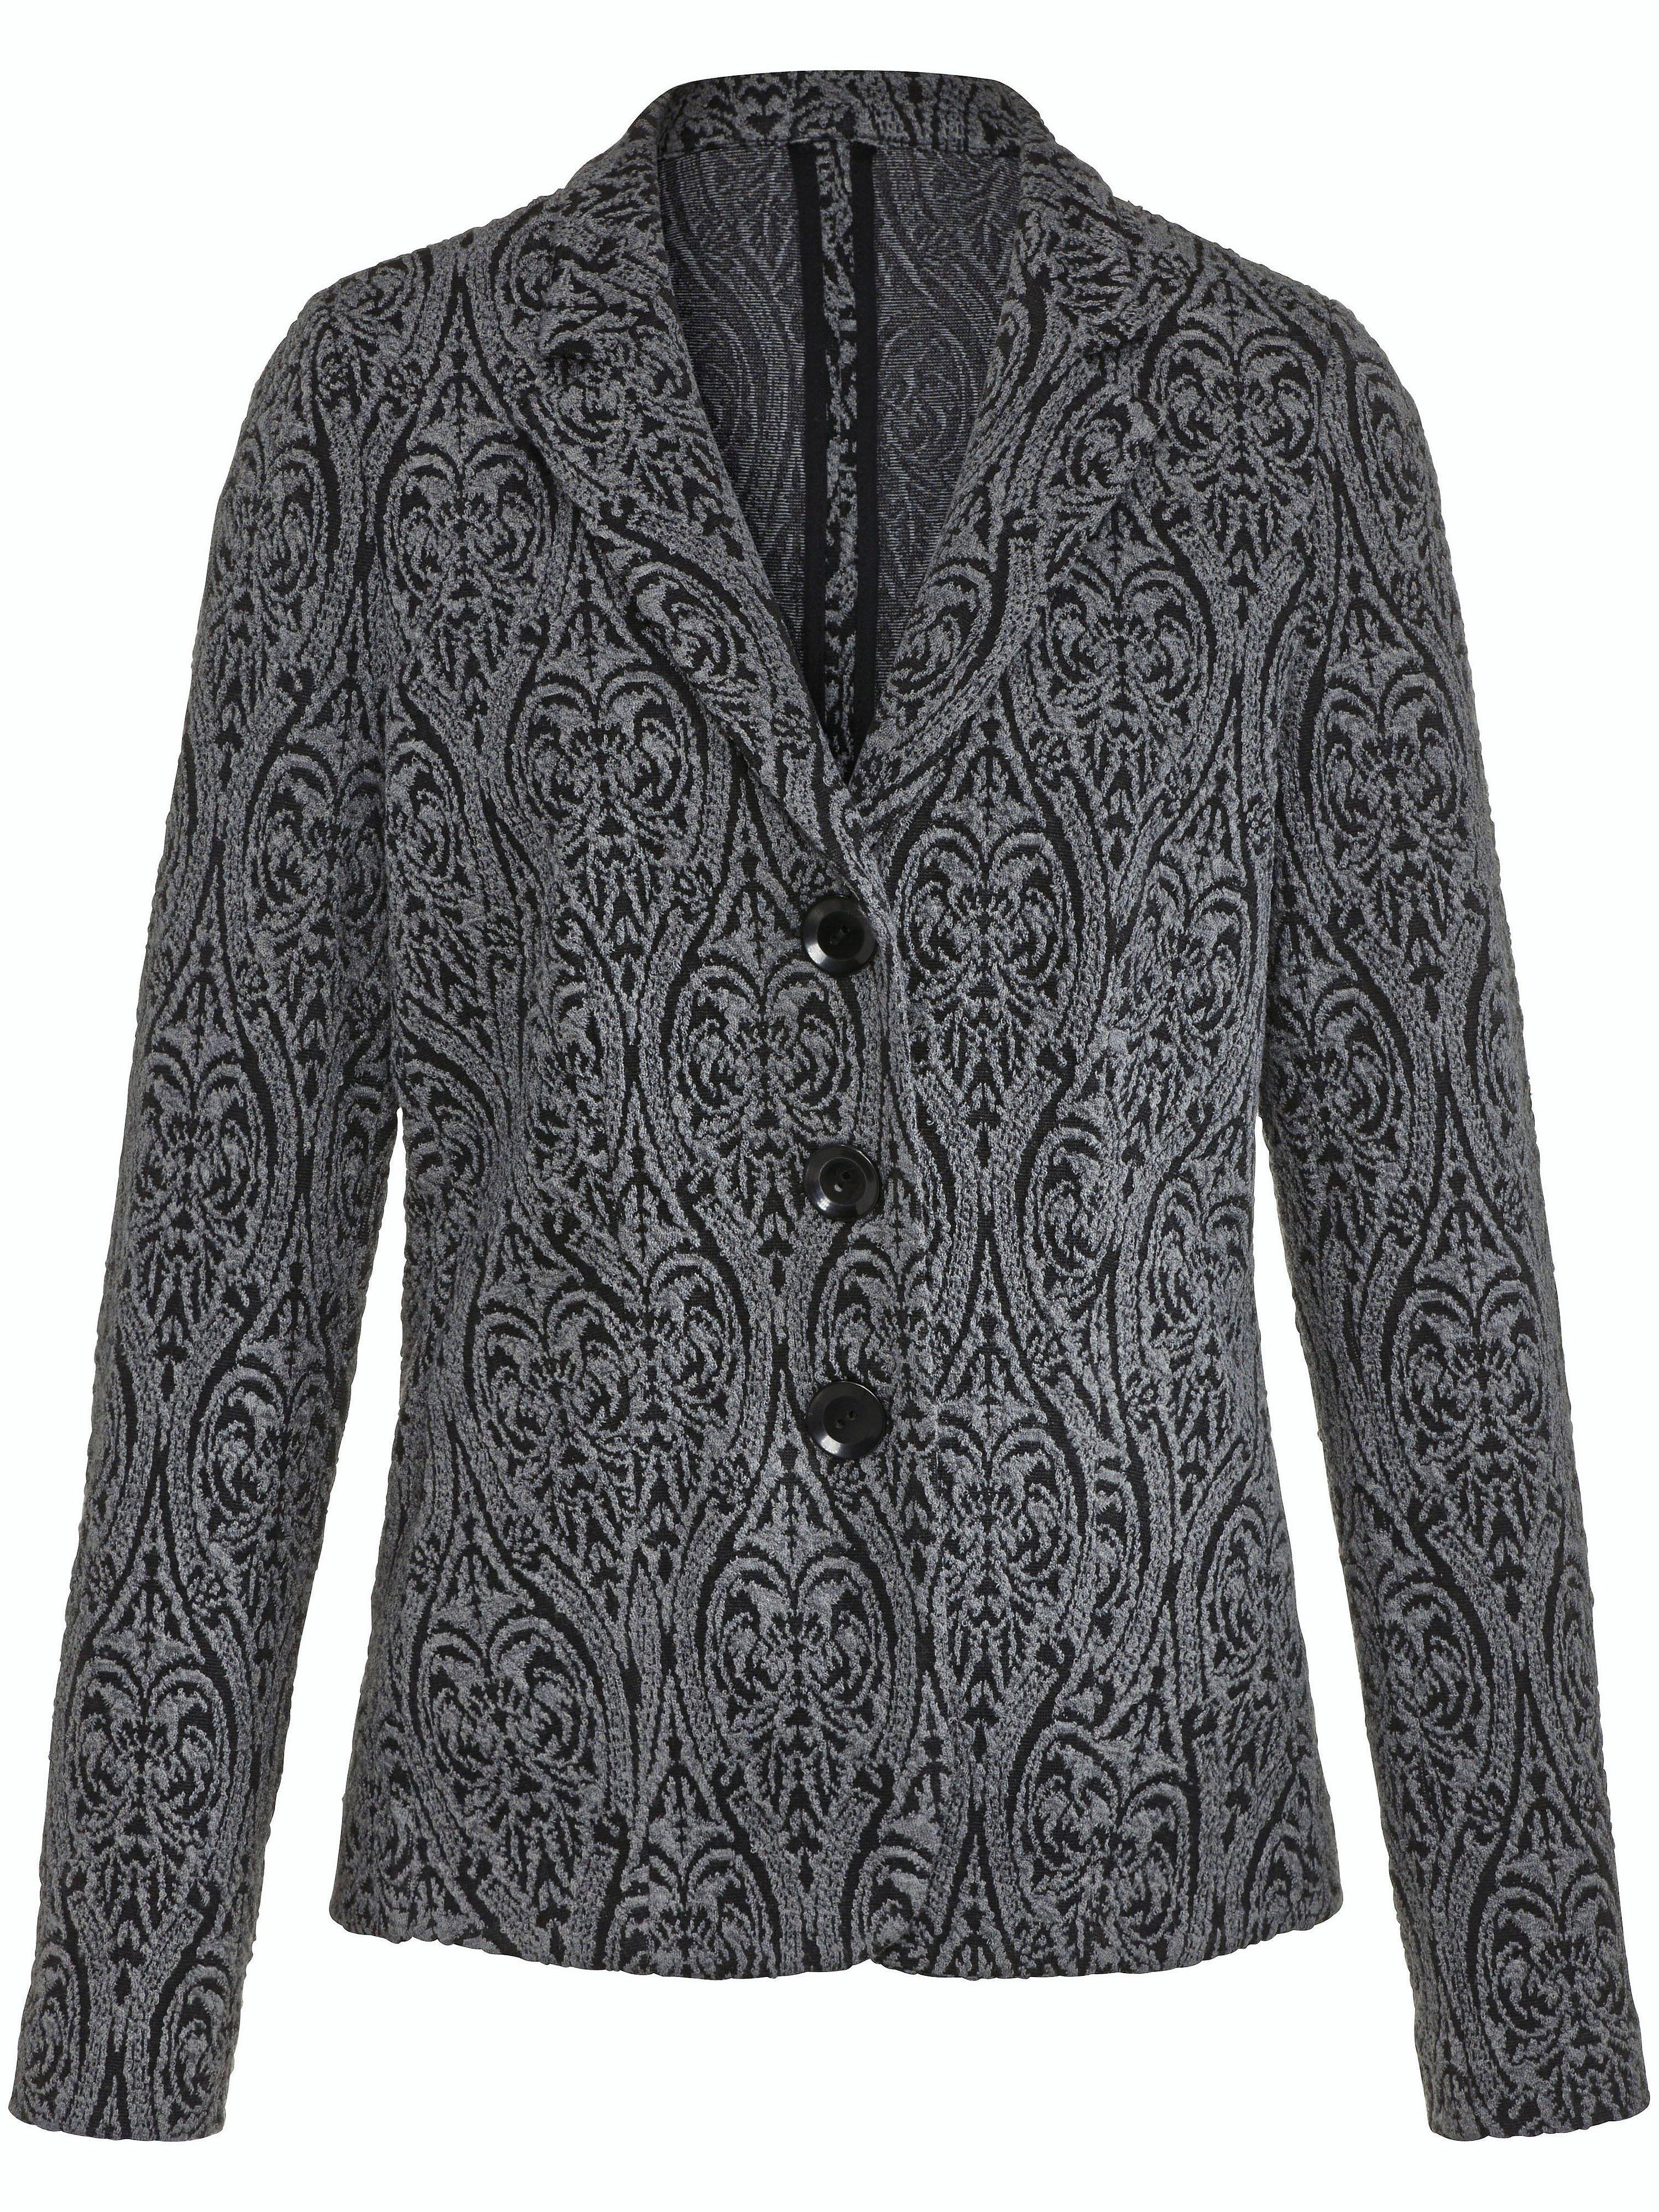 Le blazer en jersey  Rössler Selection gris